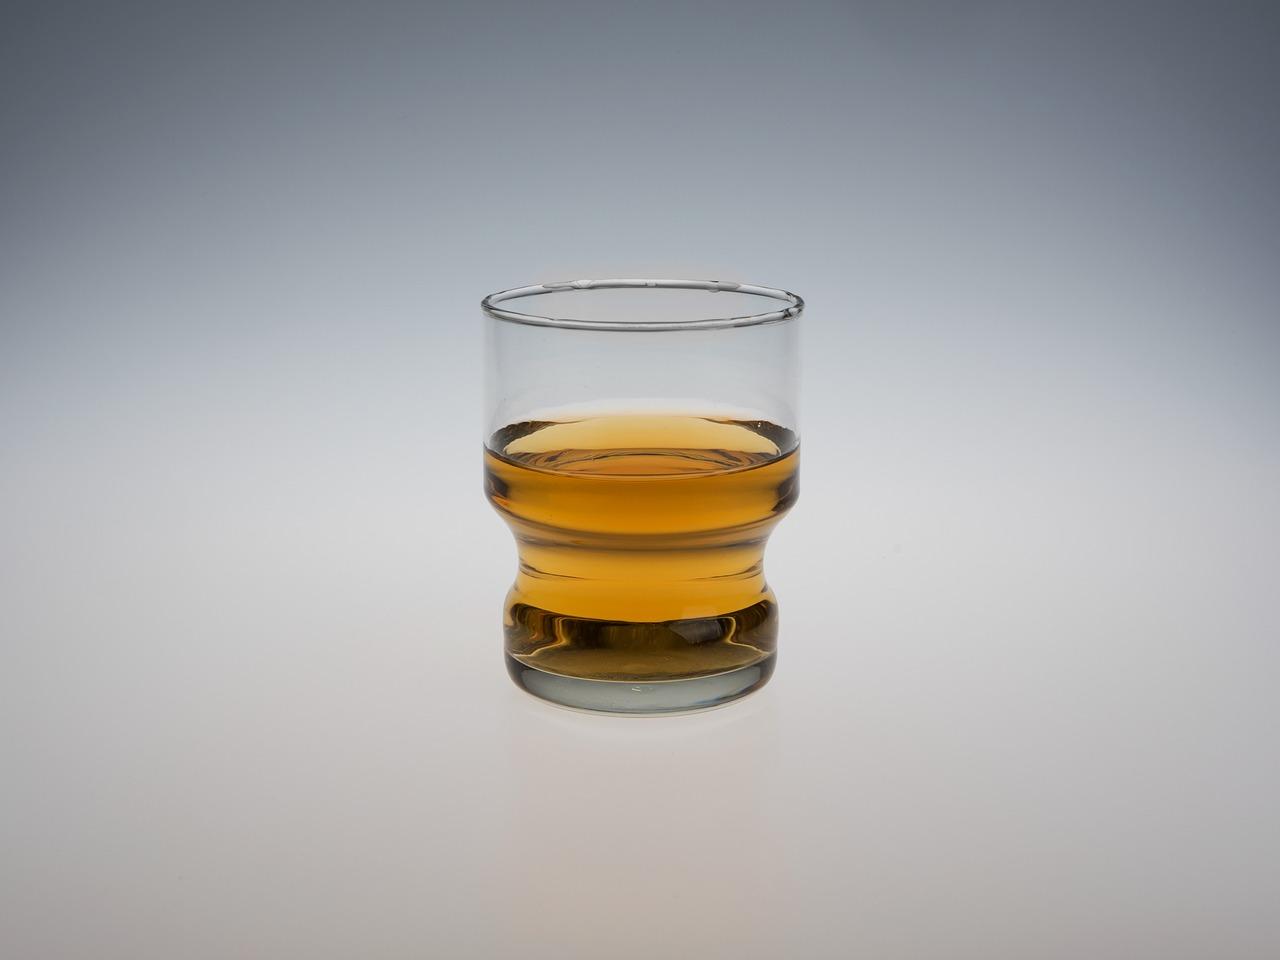 liquor-1496358_1280.jpg